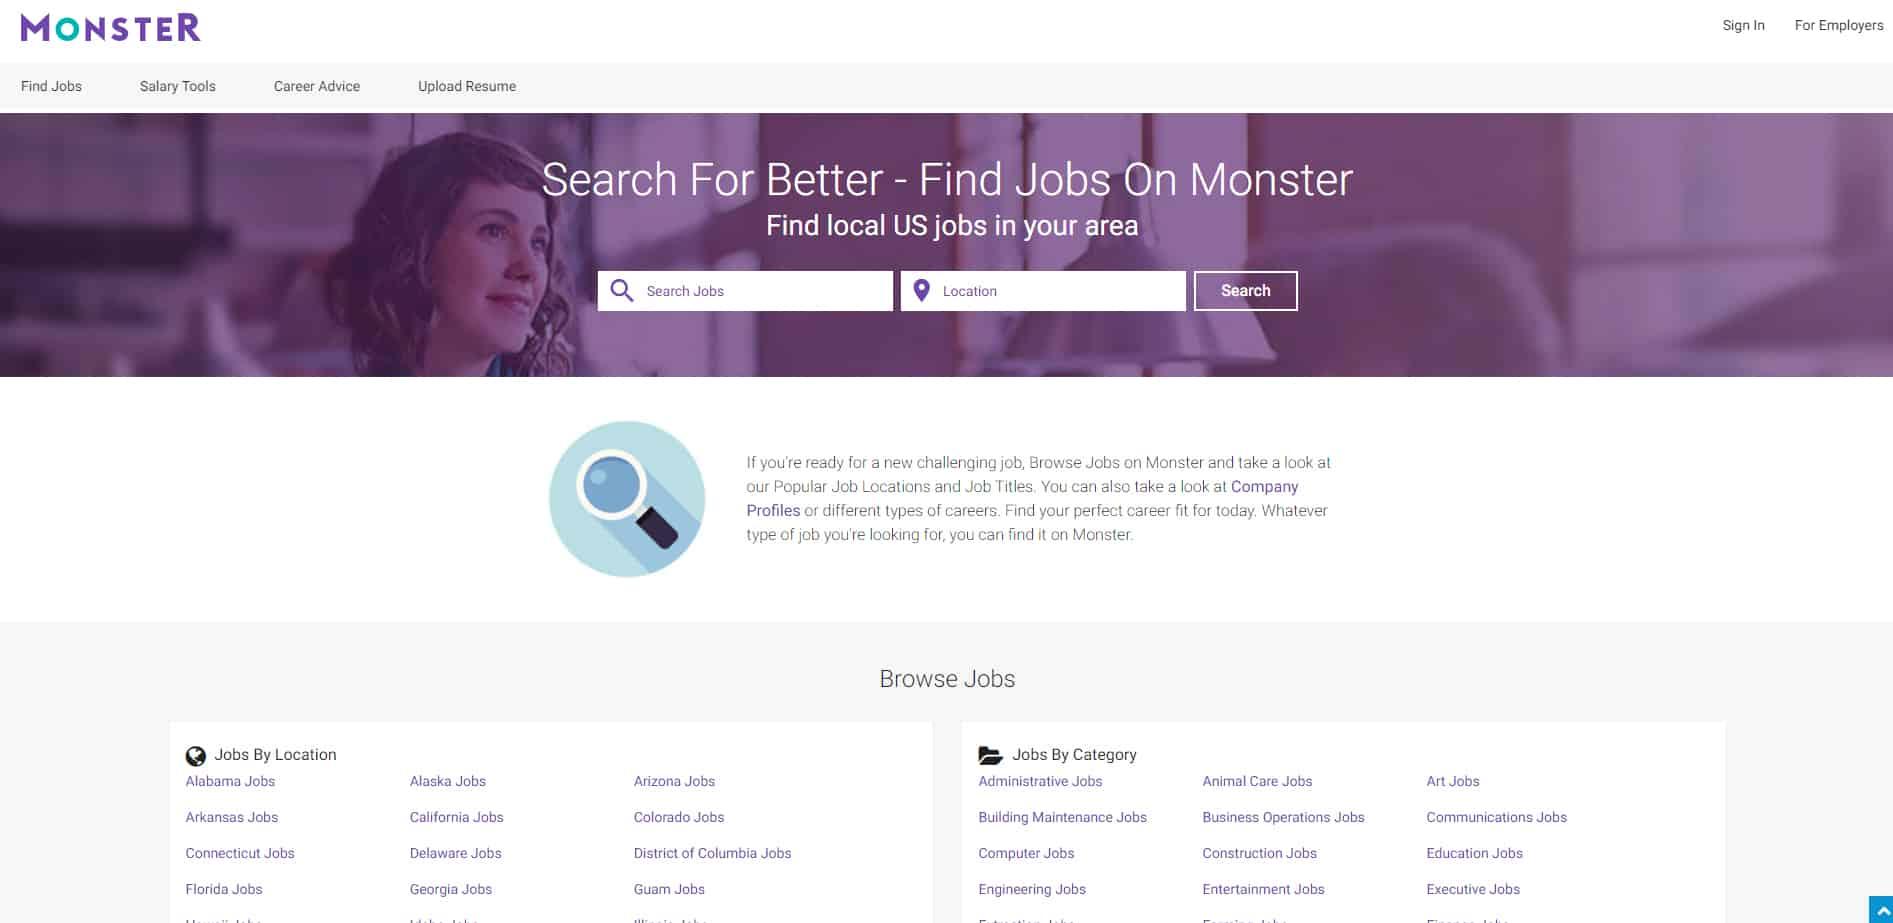 Screenshot of Monster Job Seeker Tools